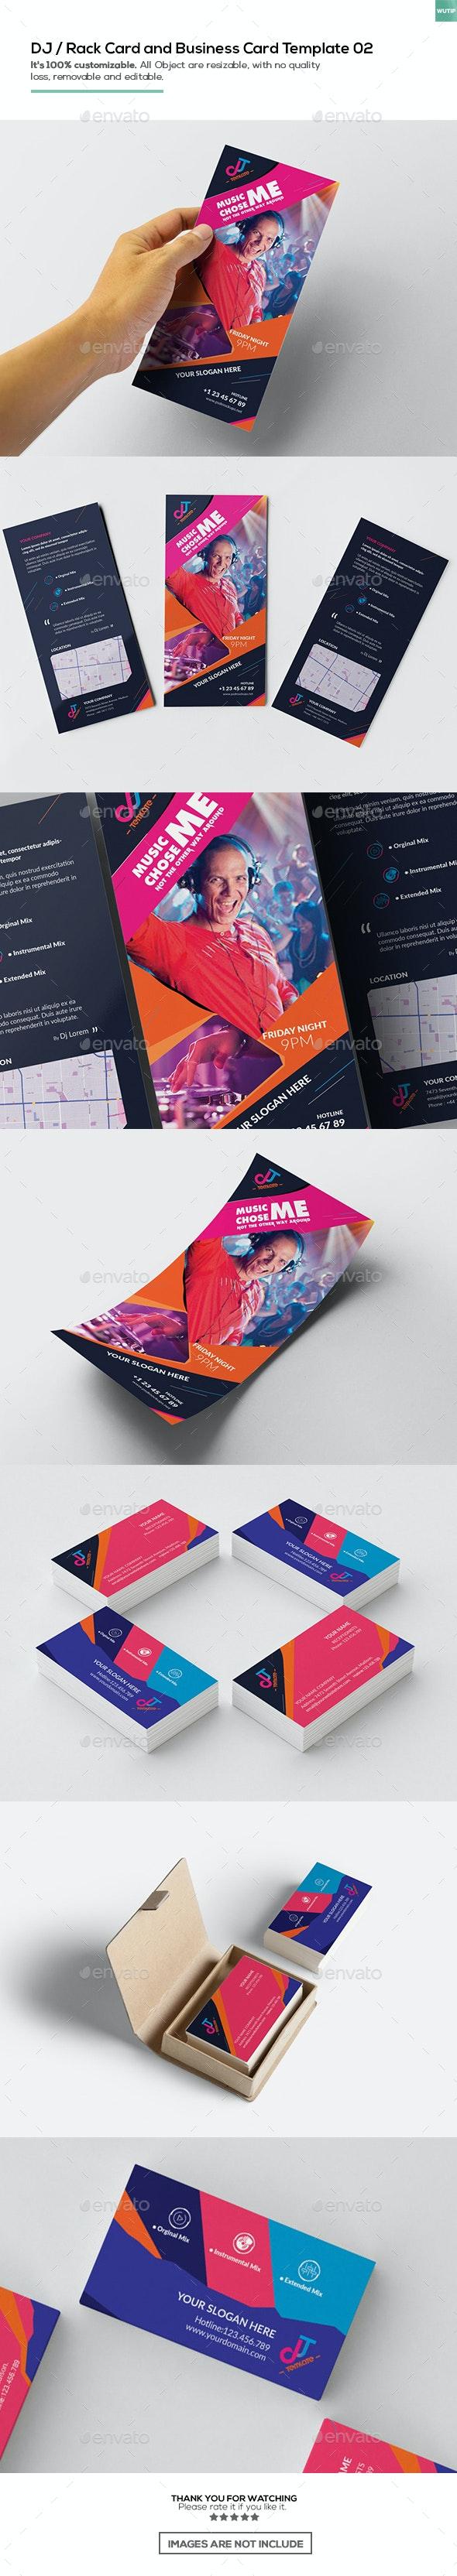 DJ / Rack Card and Business Card Template 02 - Miscellaneous Print Templates